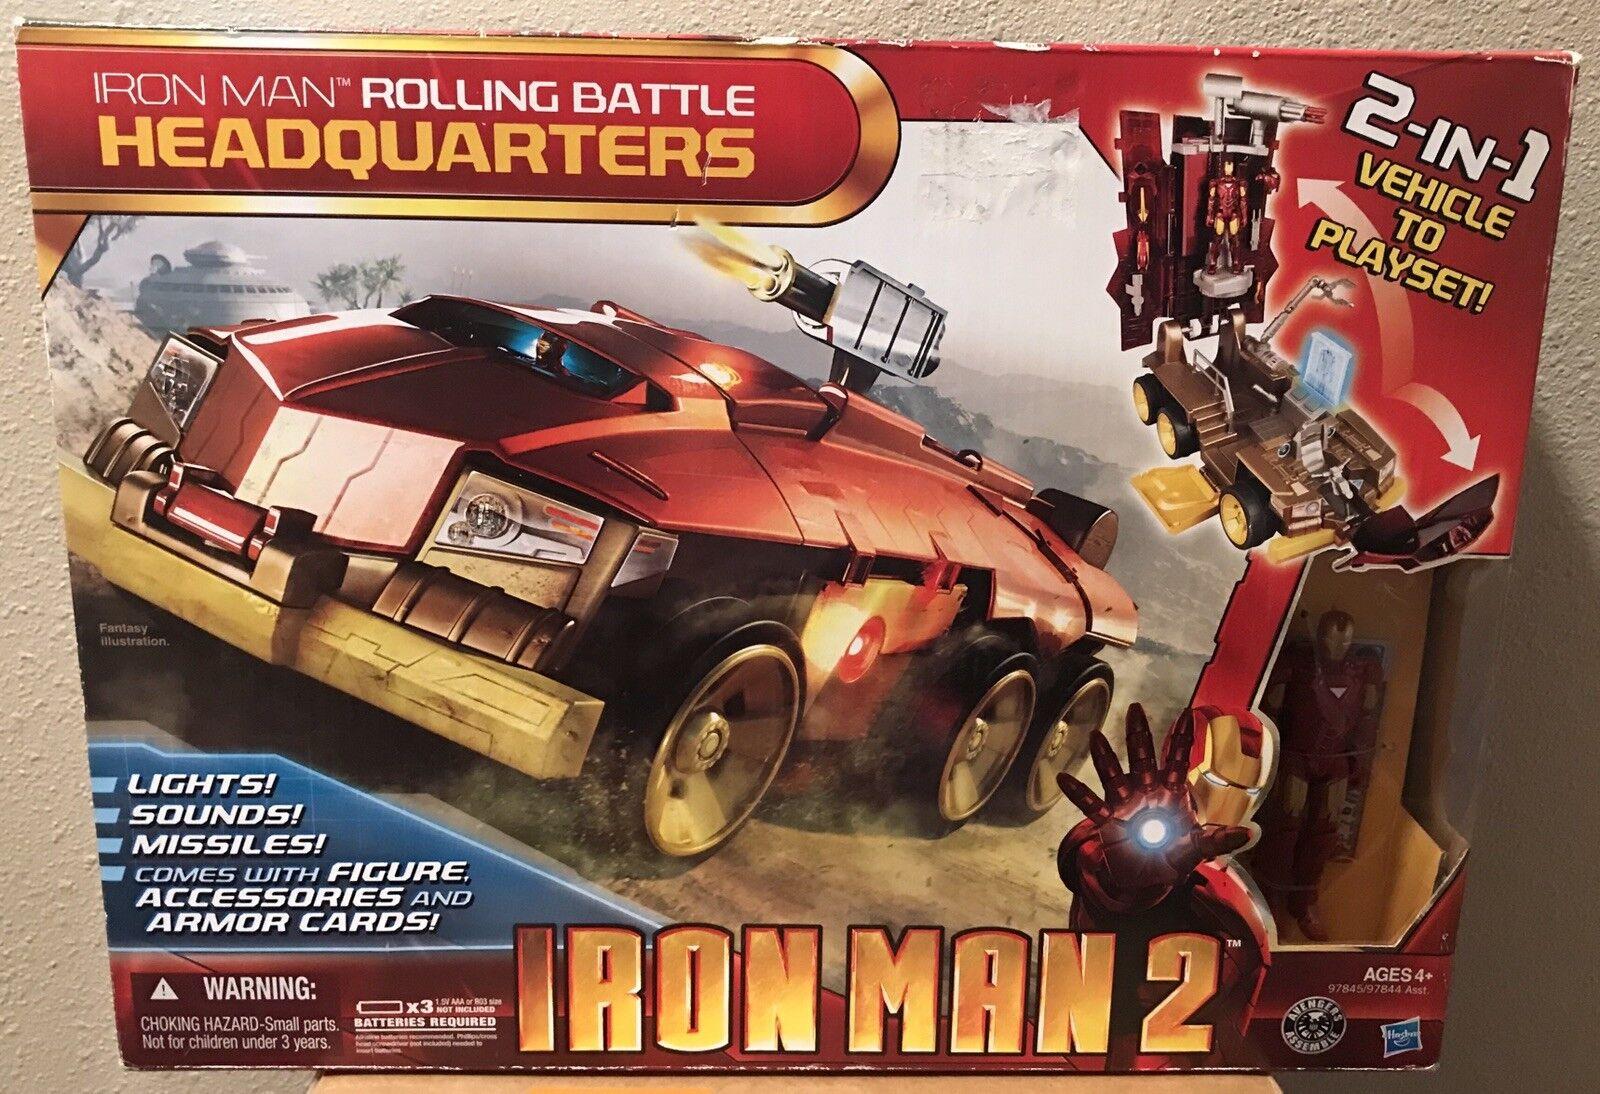 Iron man 2 walzen kampf hauptquartier 2 in 1 fahrzeug hat licht & klingt feder